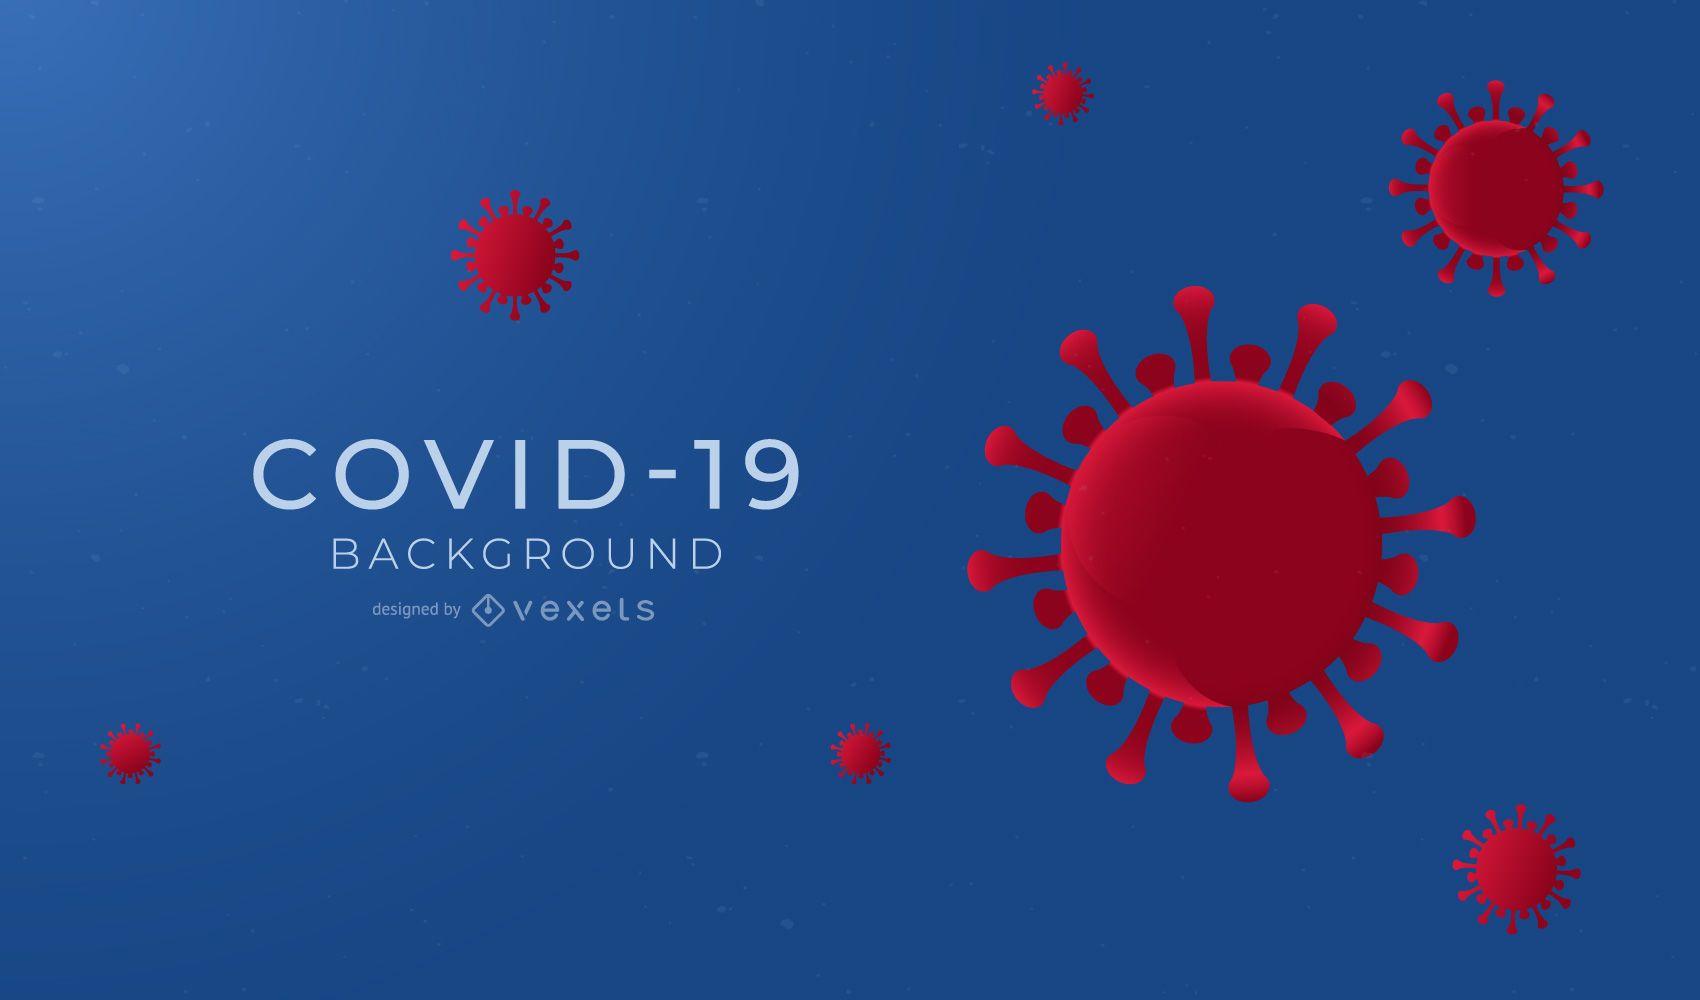 COVID-19 Simple Background Design